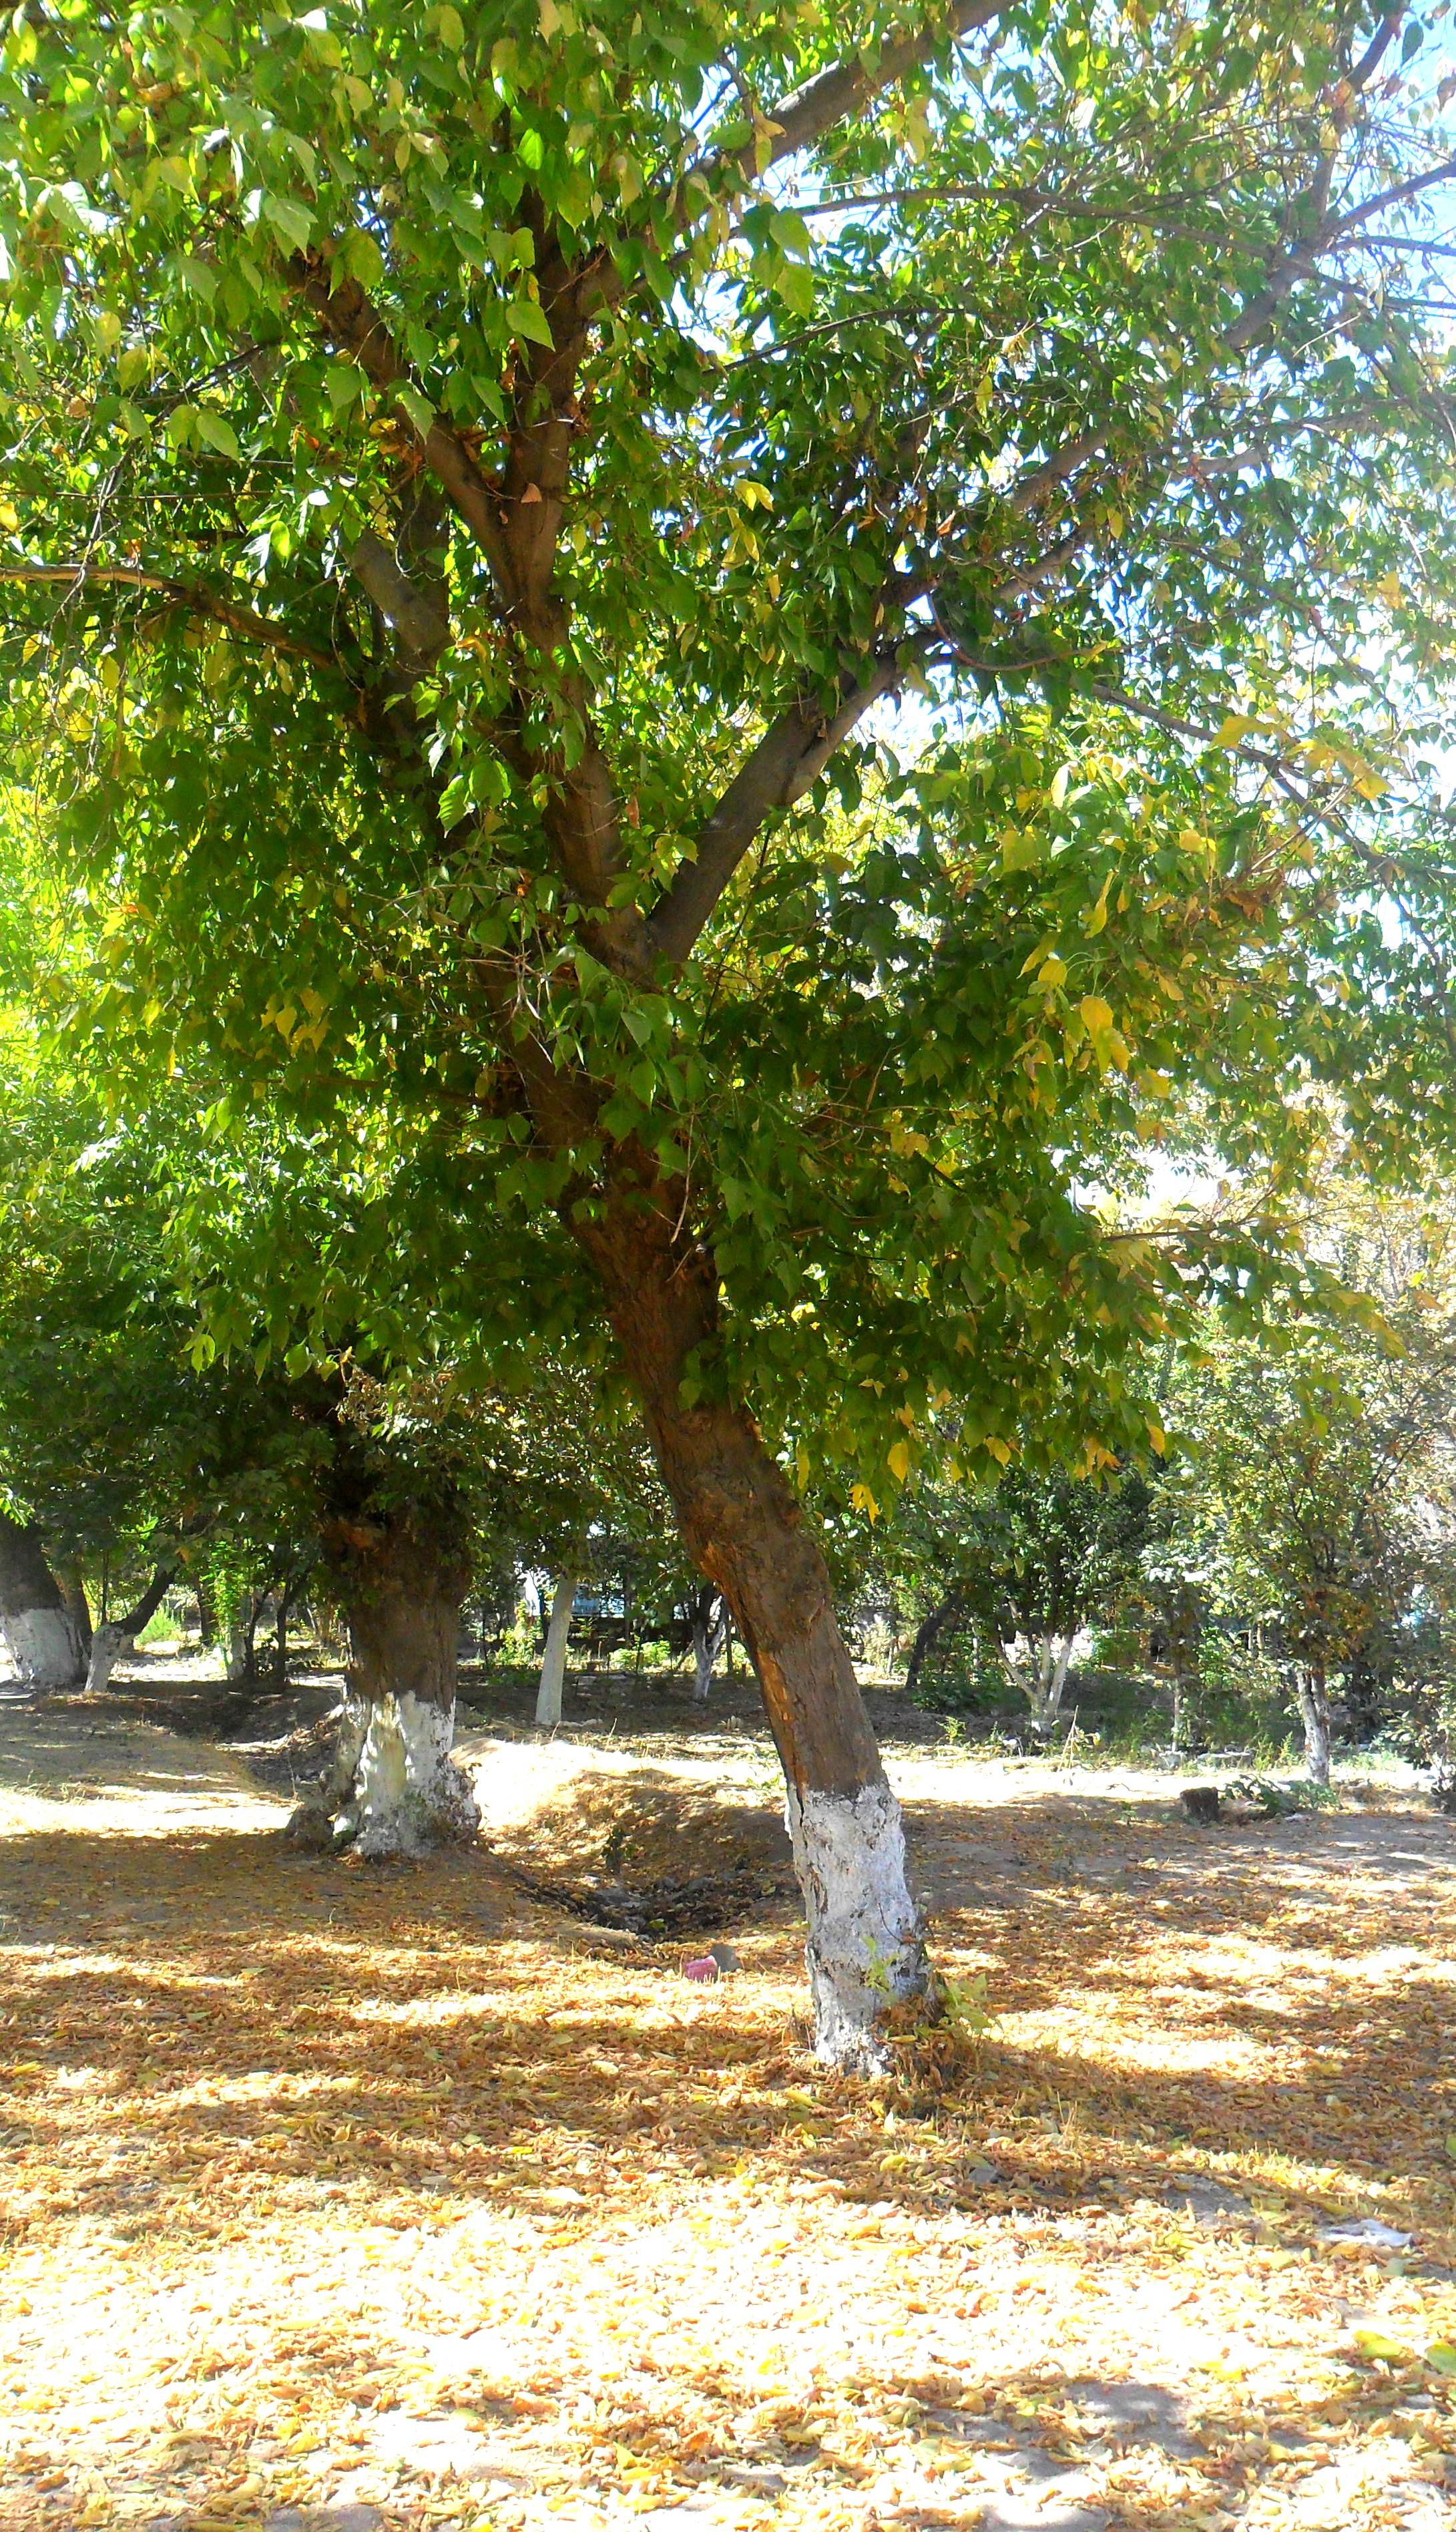 Фото конкурс: Осень в моем городе  9fda1784343e